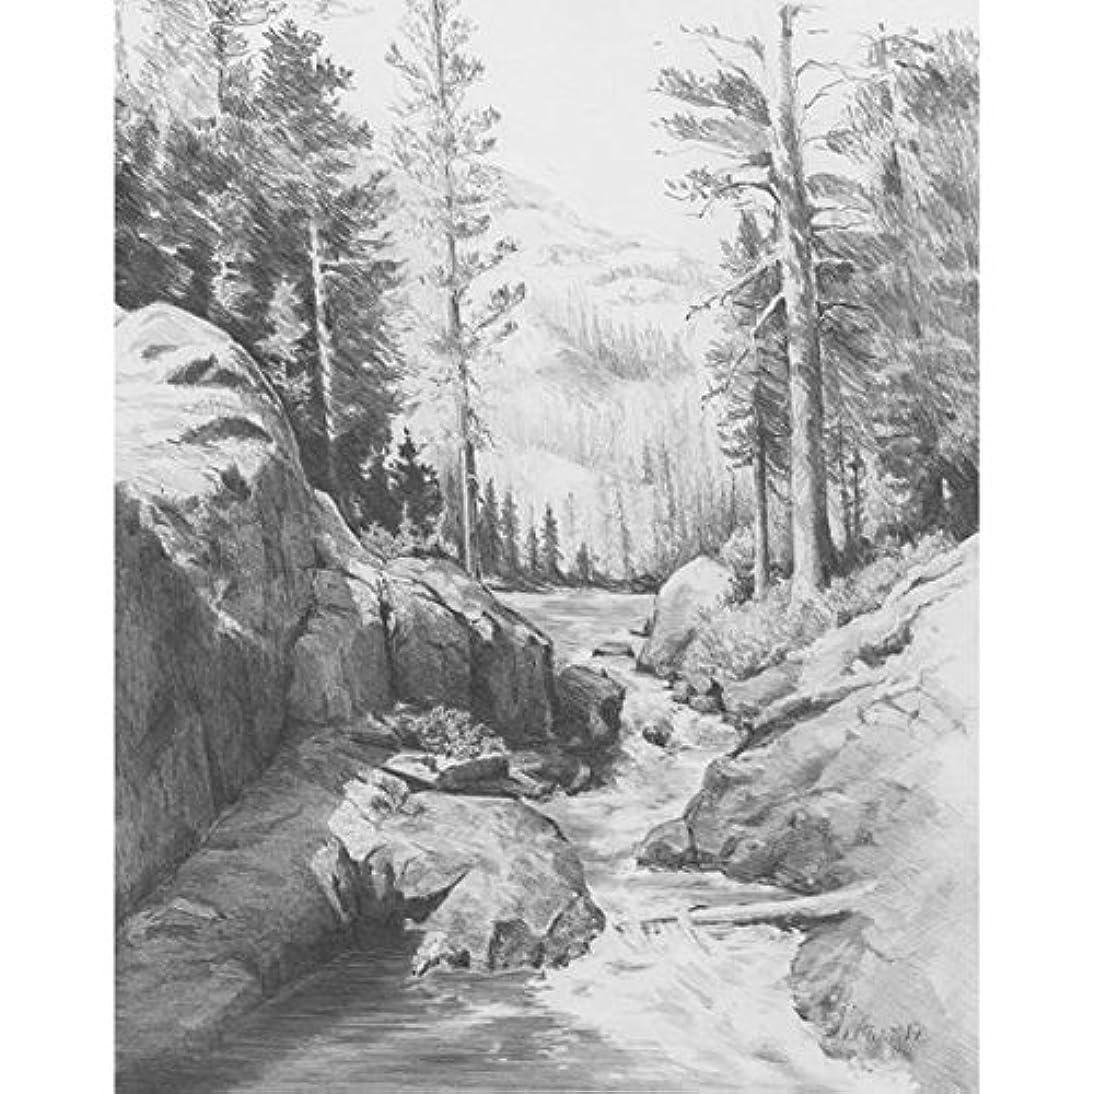 ROYAL BRUSH Sketching Made Easy Kit, 9 by 12-Inch, Shadow Lake